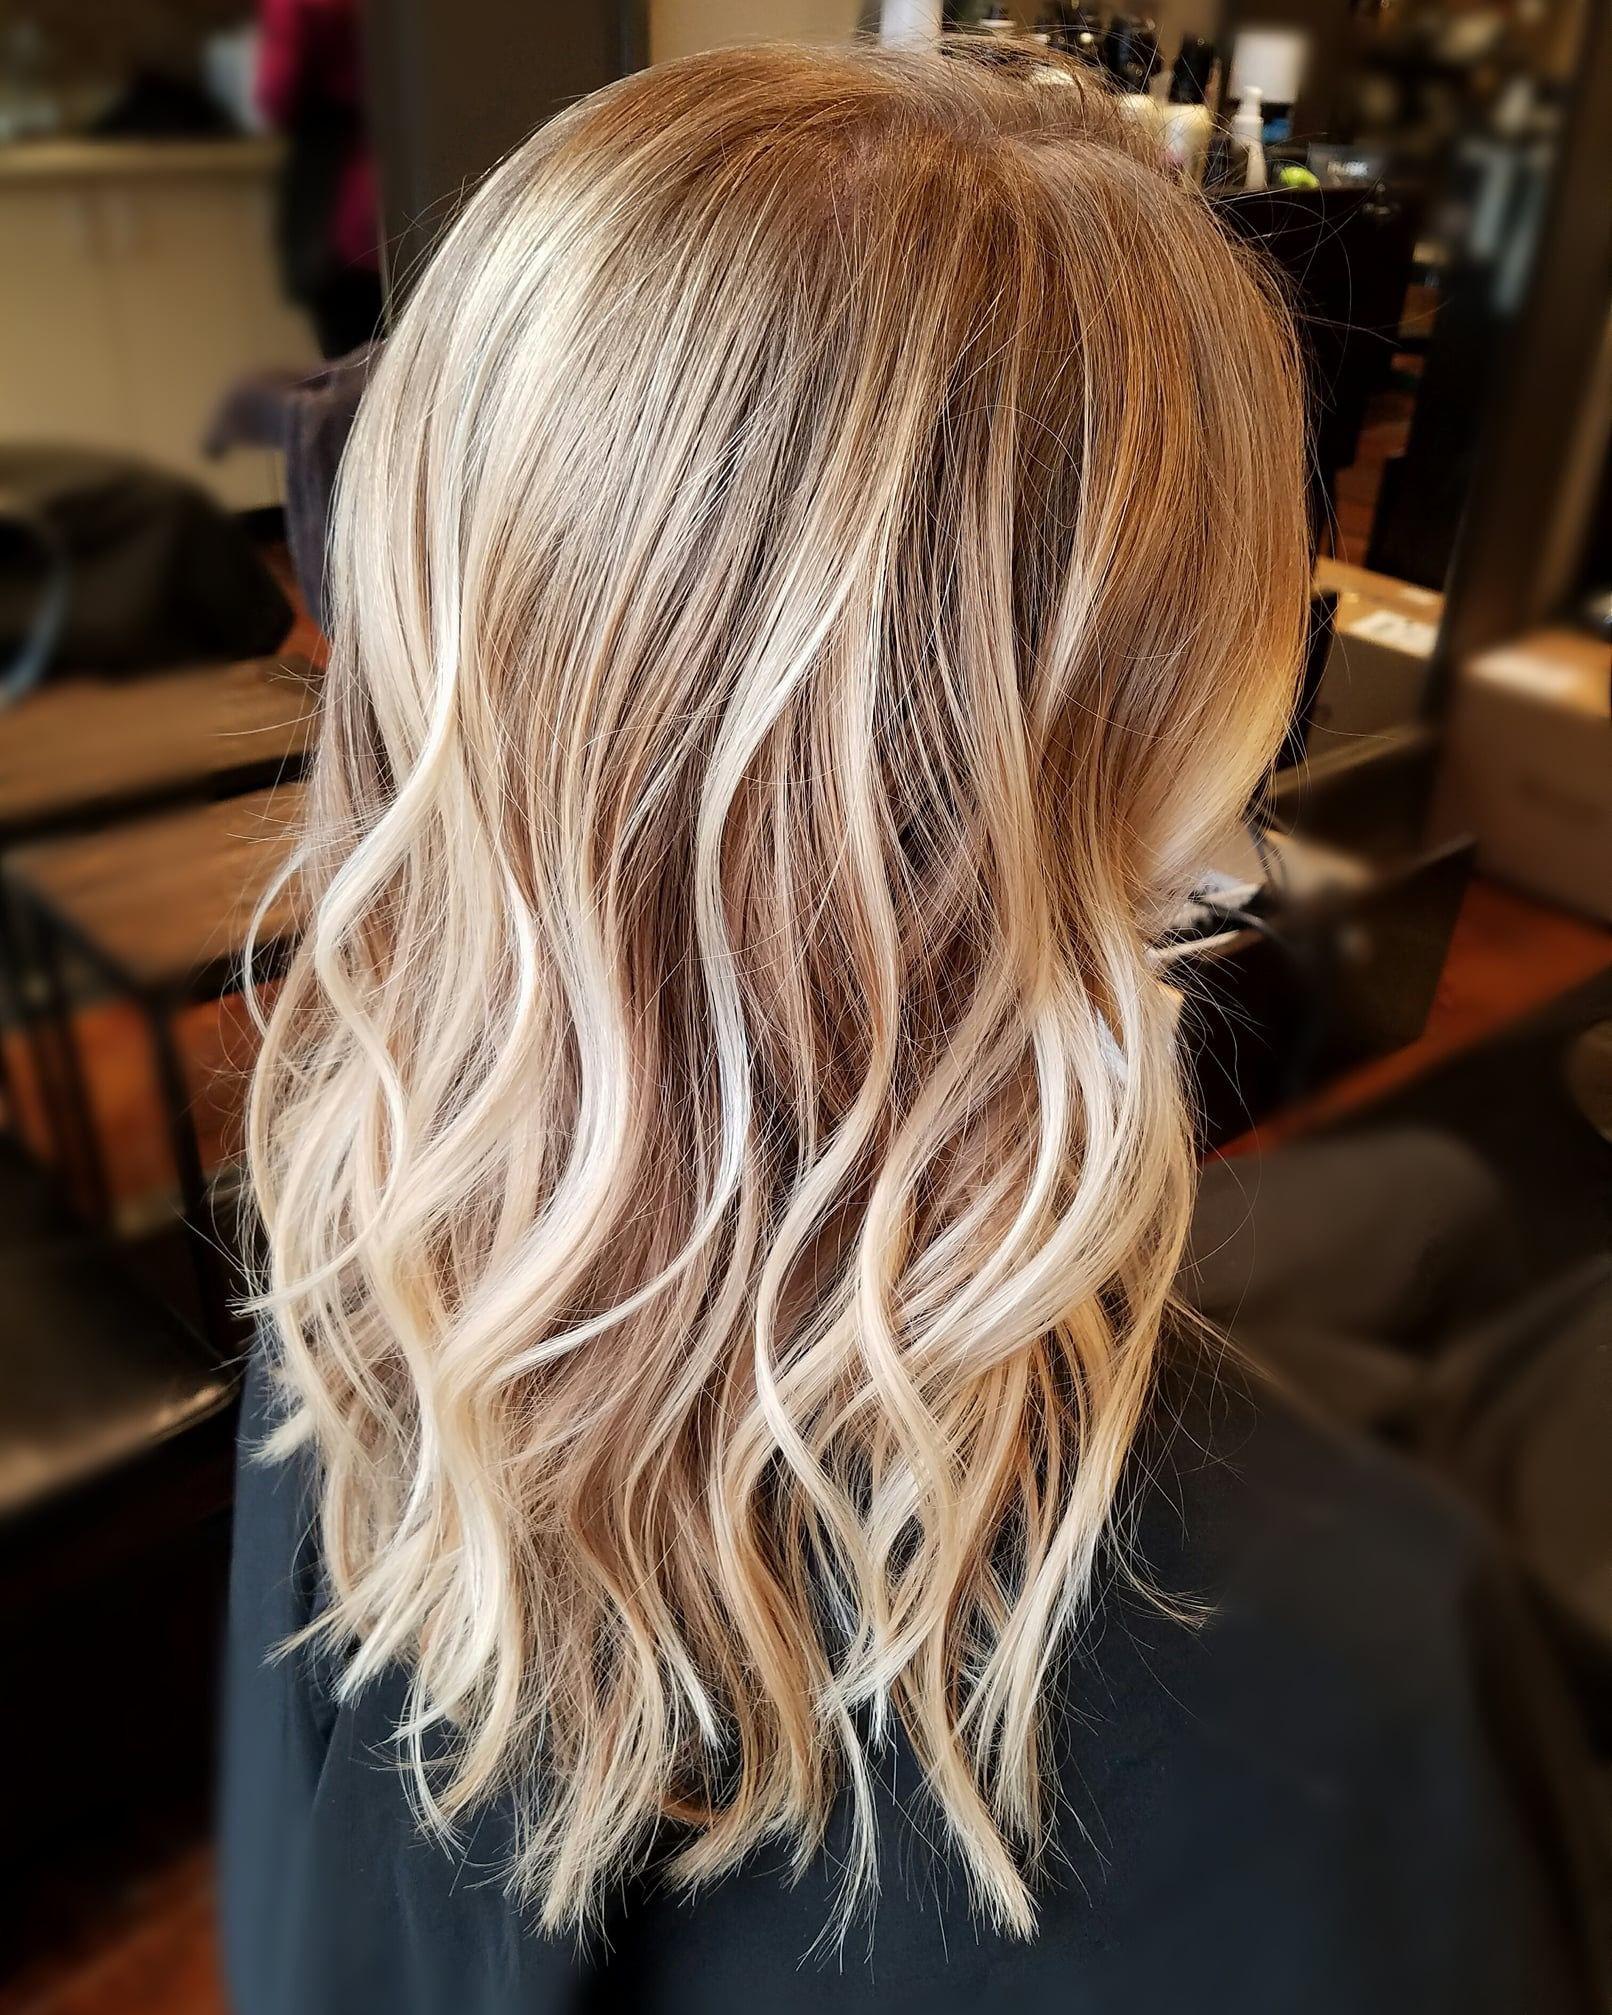 Blonde highlight pics — pic 8